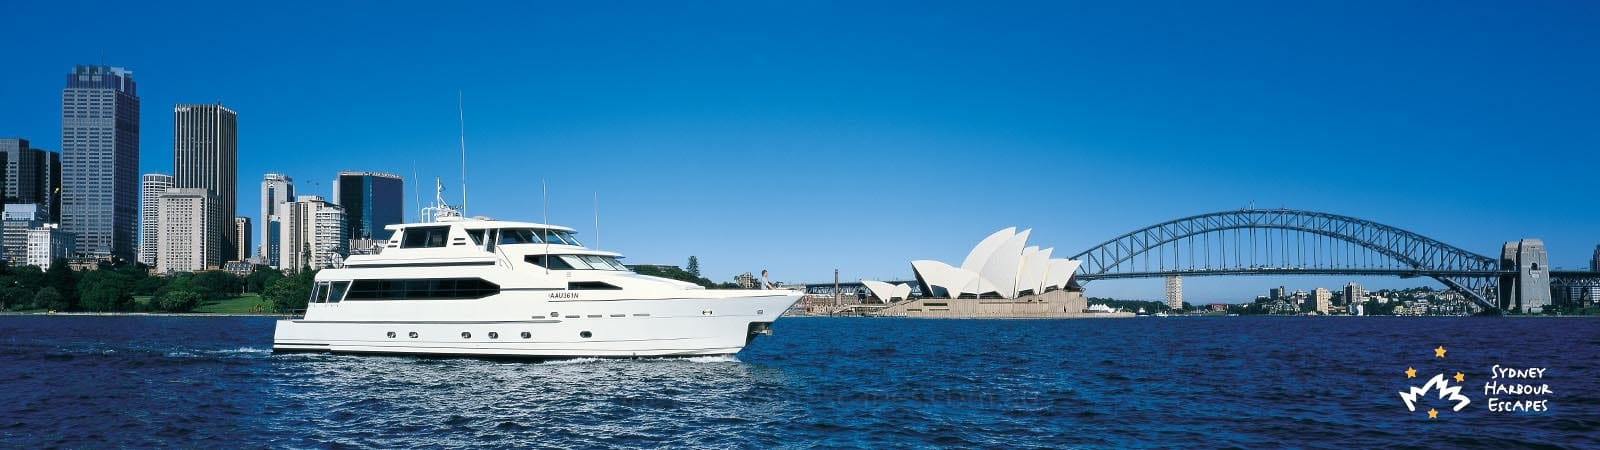 luxury charter boat sydney harbour - photo#25